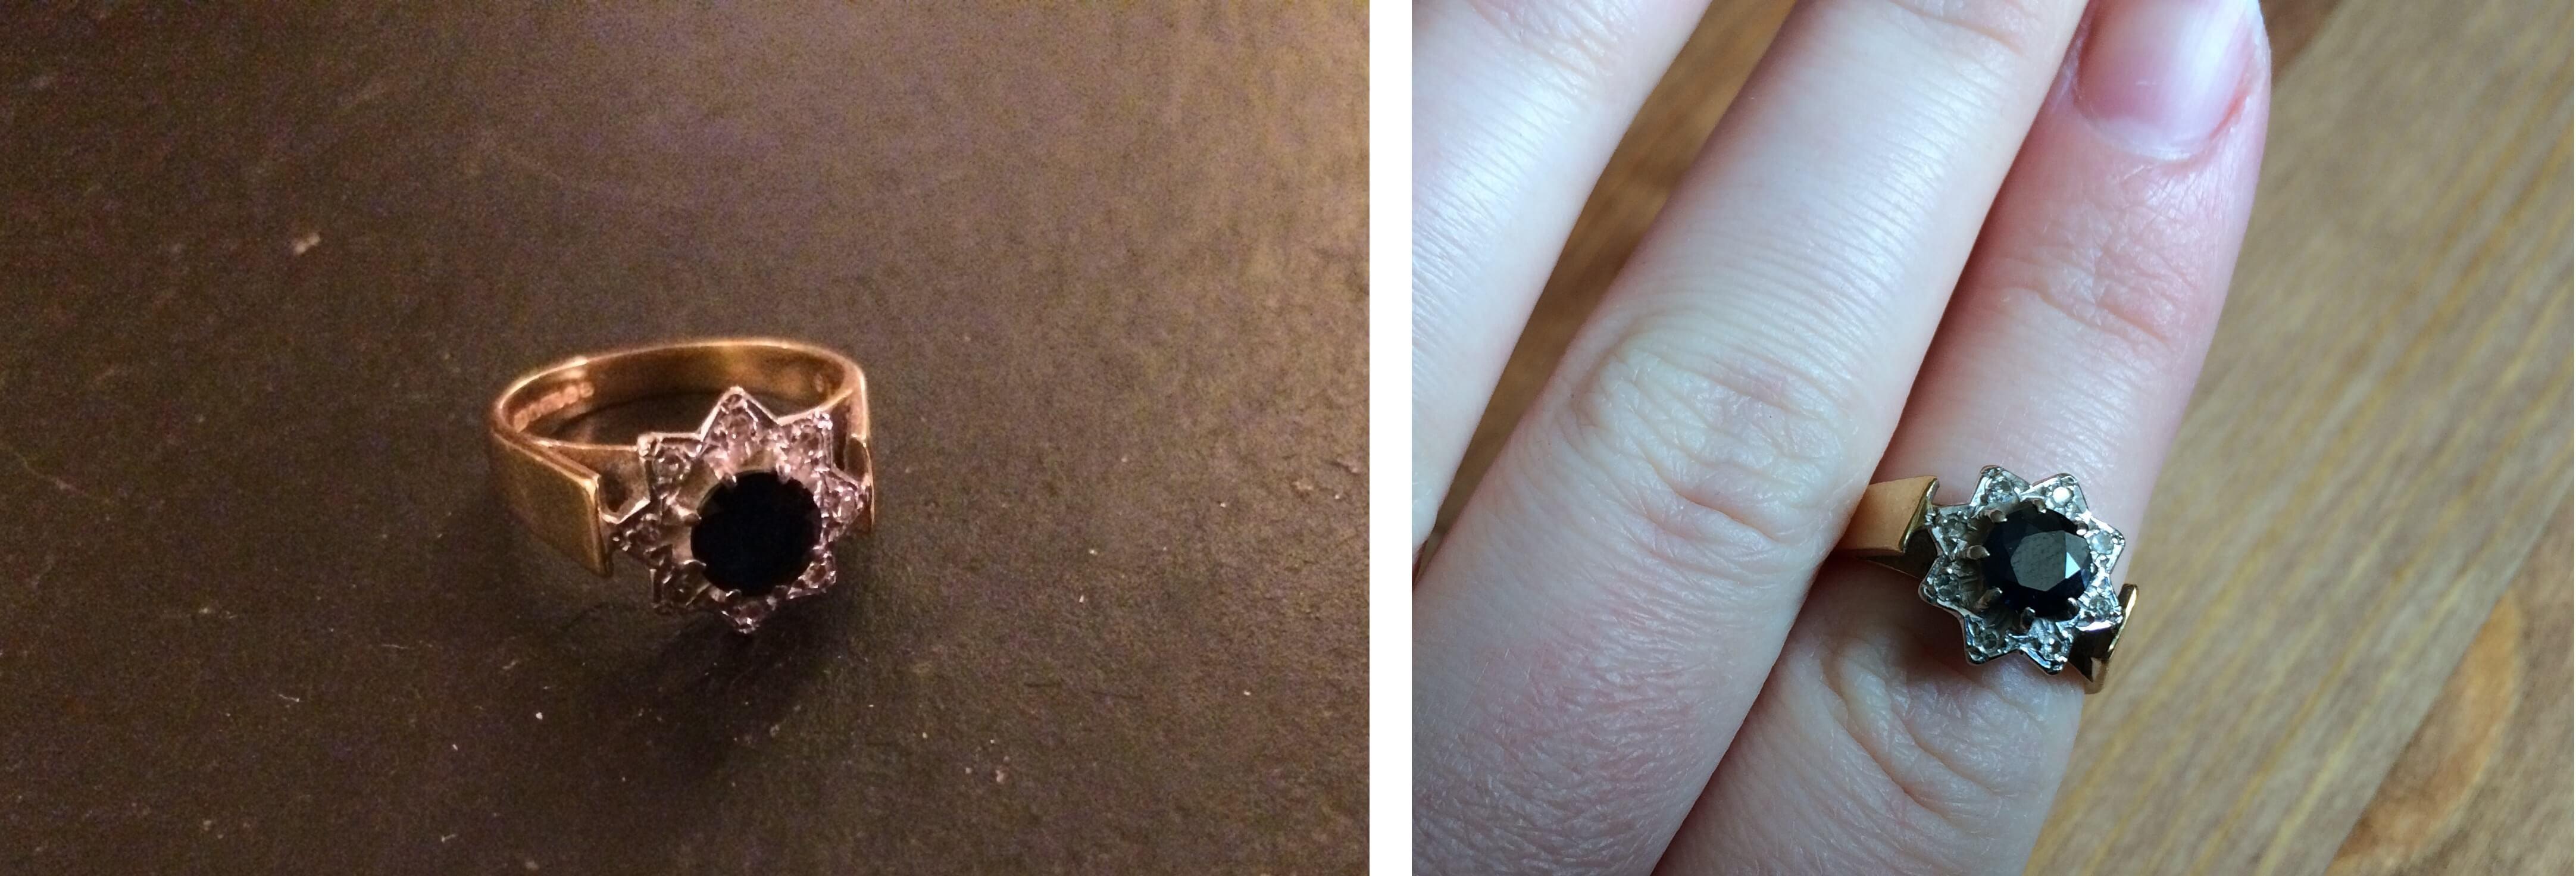 Jodie Gearing Inheirited Ring RedesignInheirited Ring Redesign